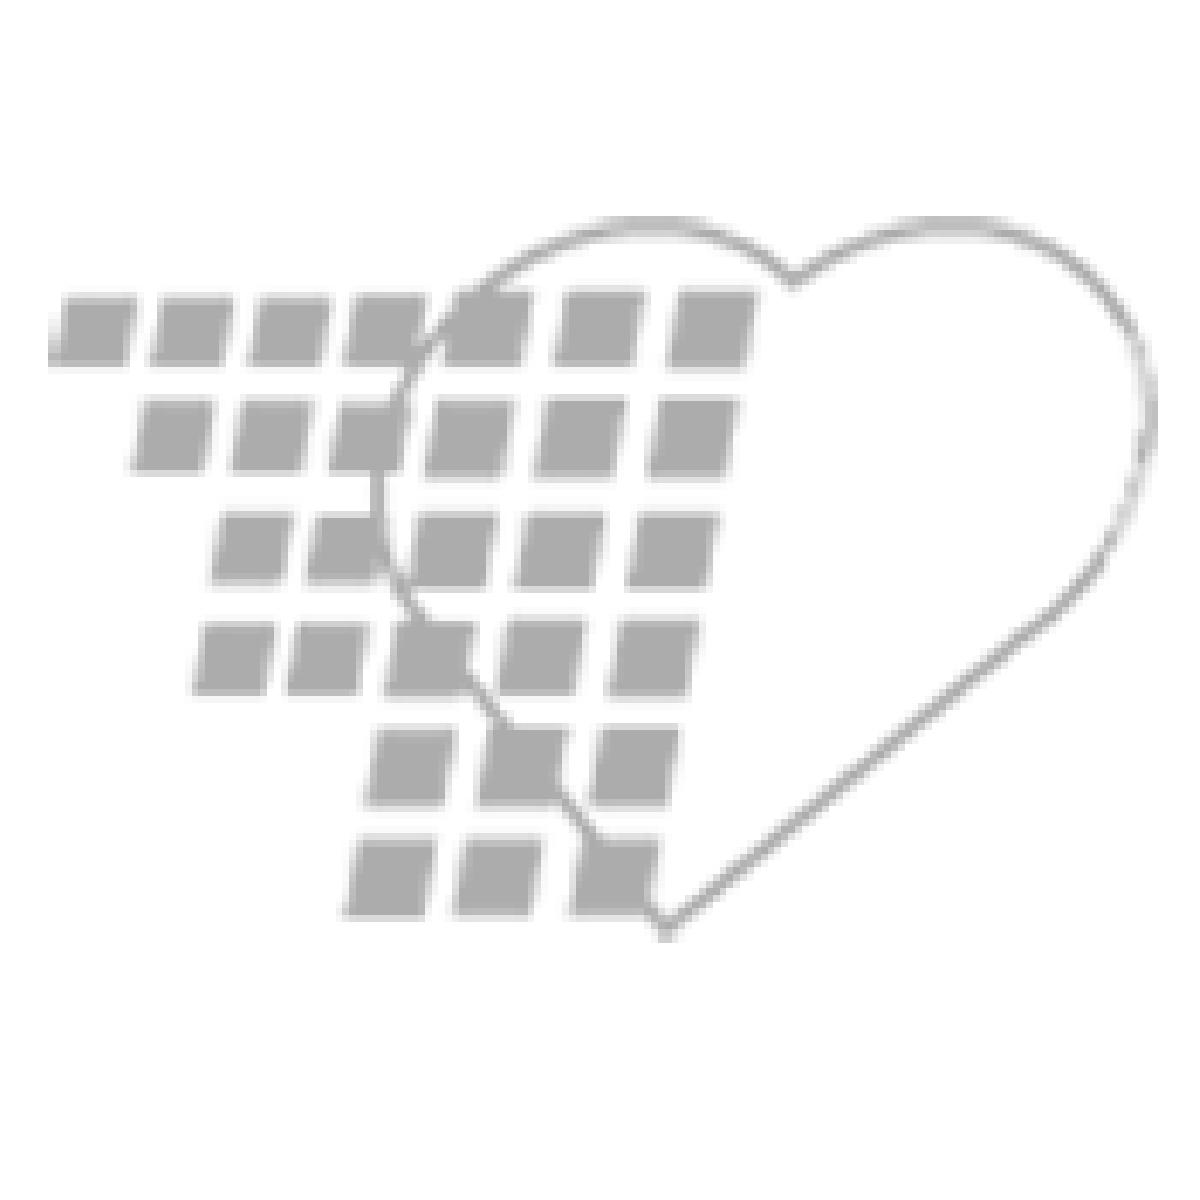 02-99-7560 - Welch Allyn Lead Acid Battery Panasonic 6v